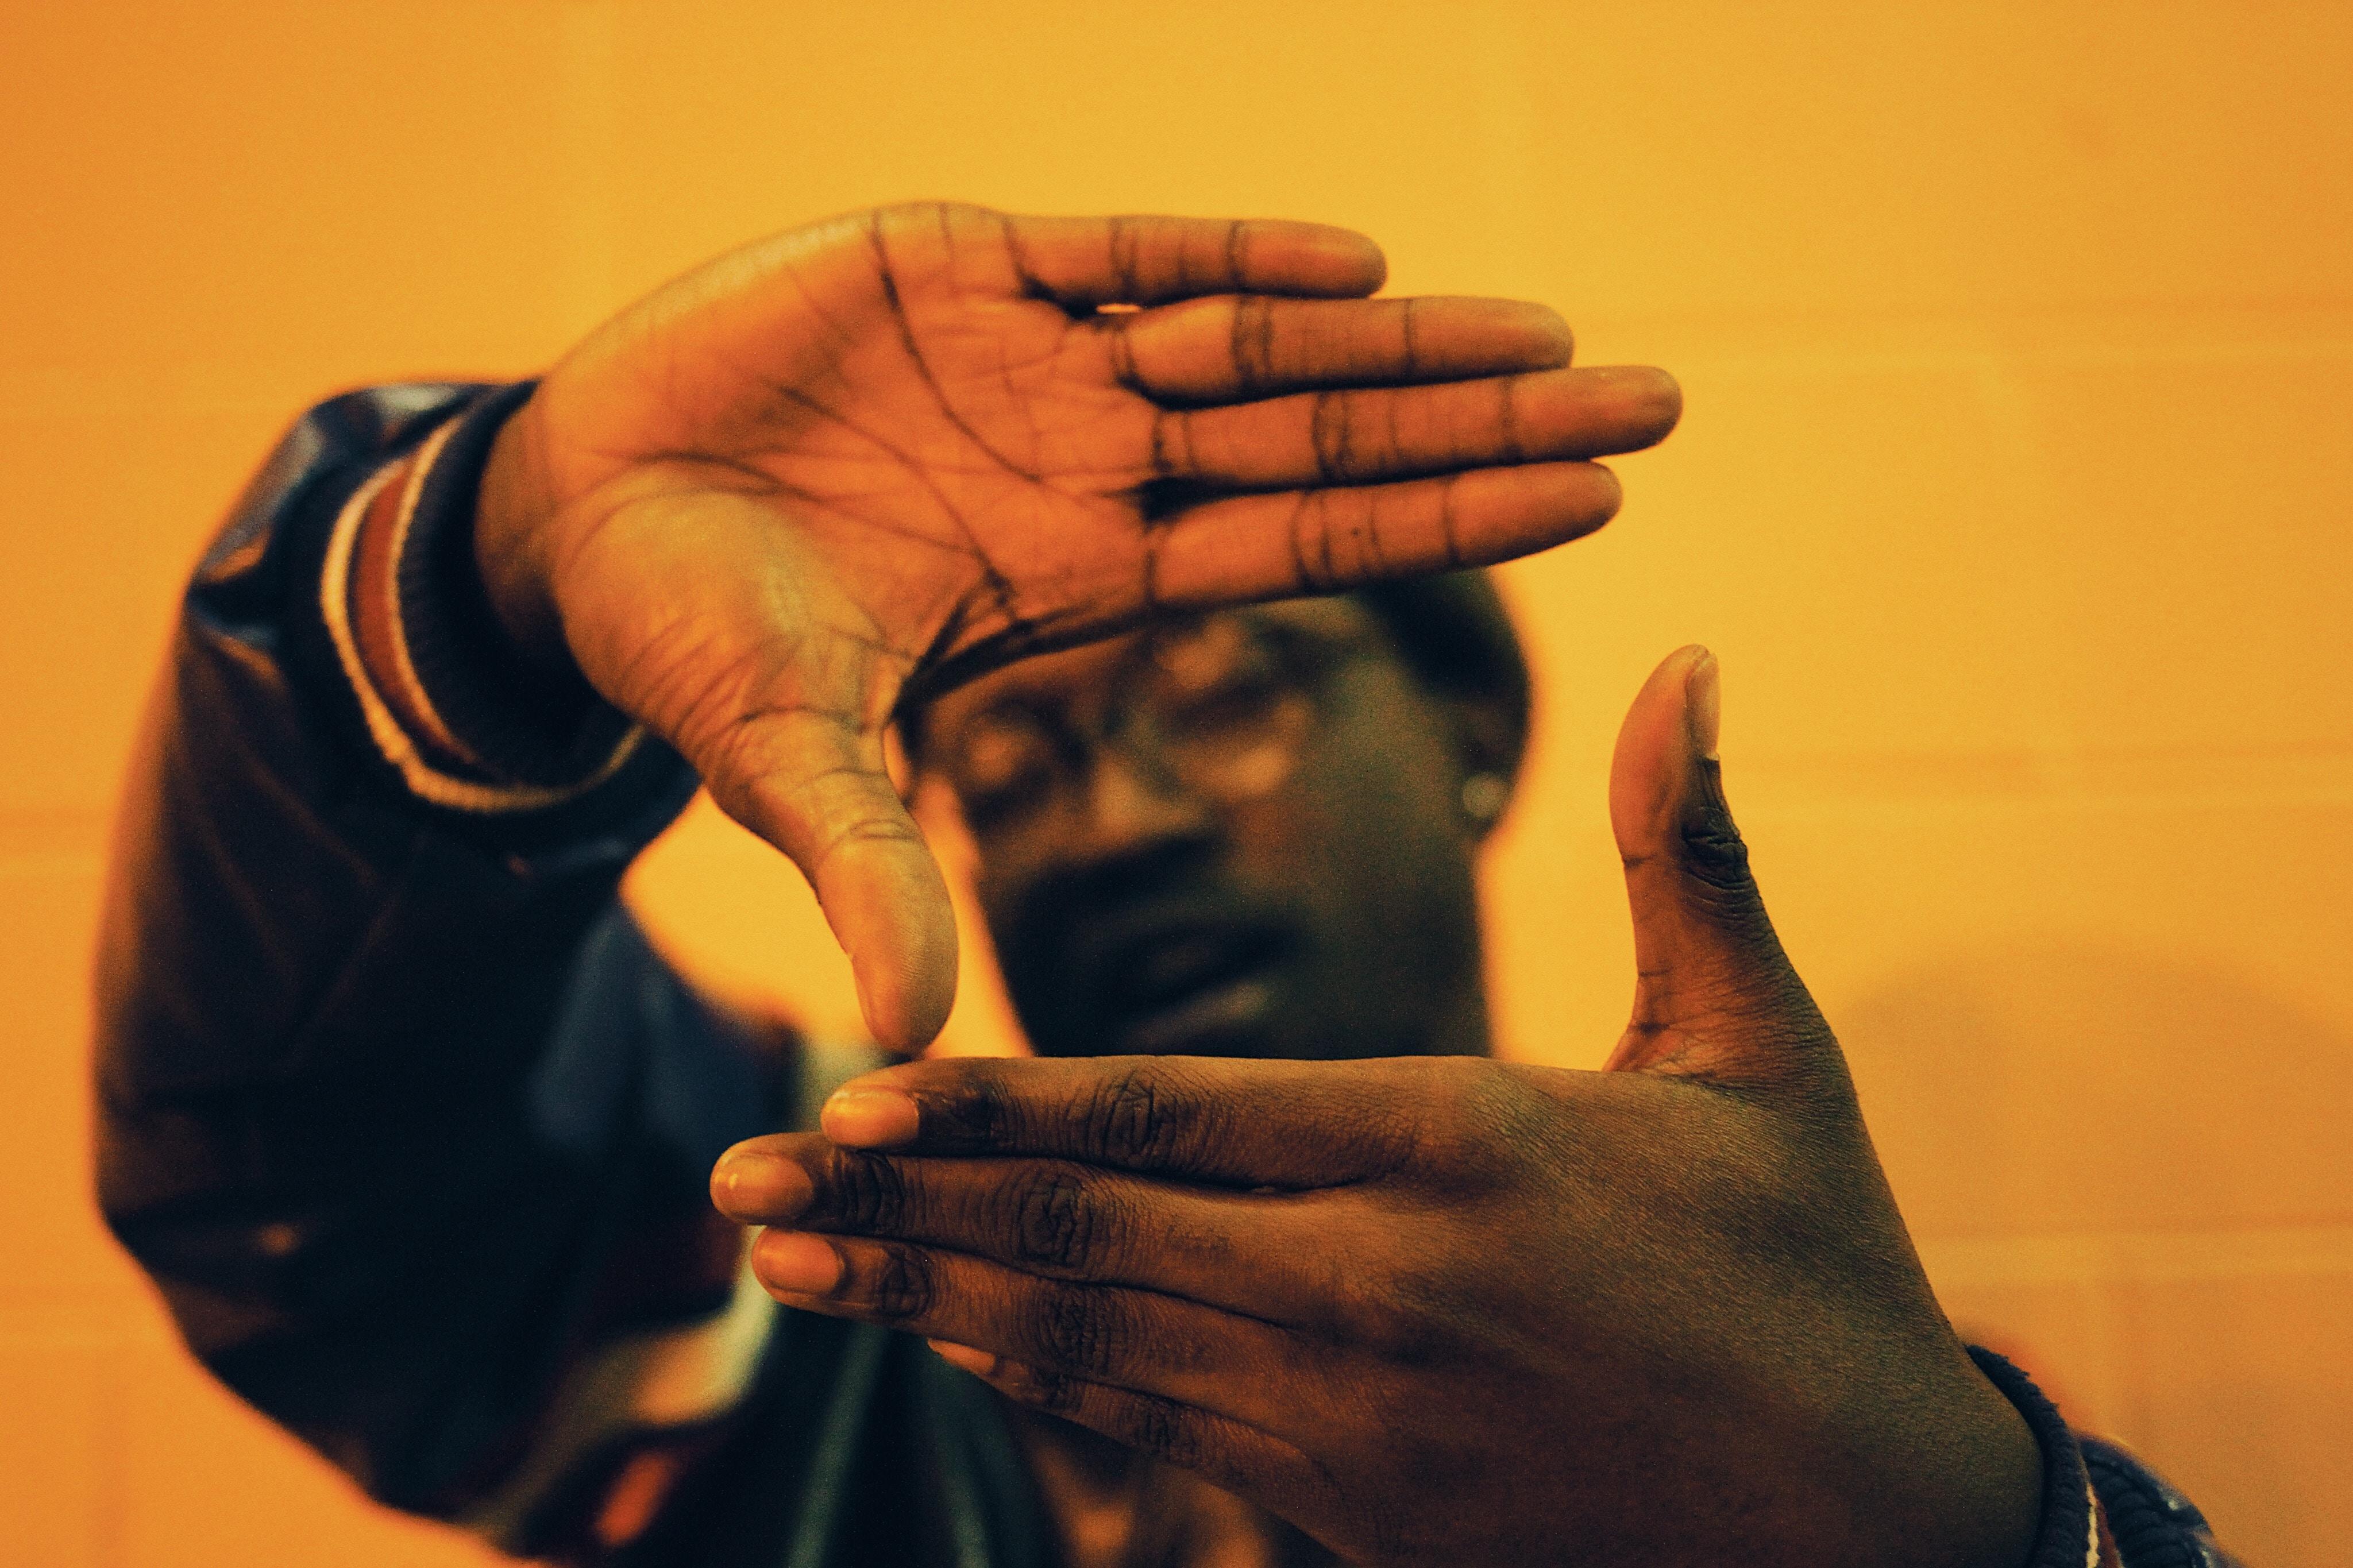 man doing hand gesture